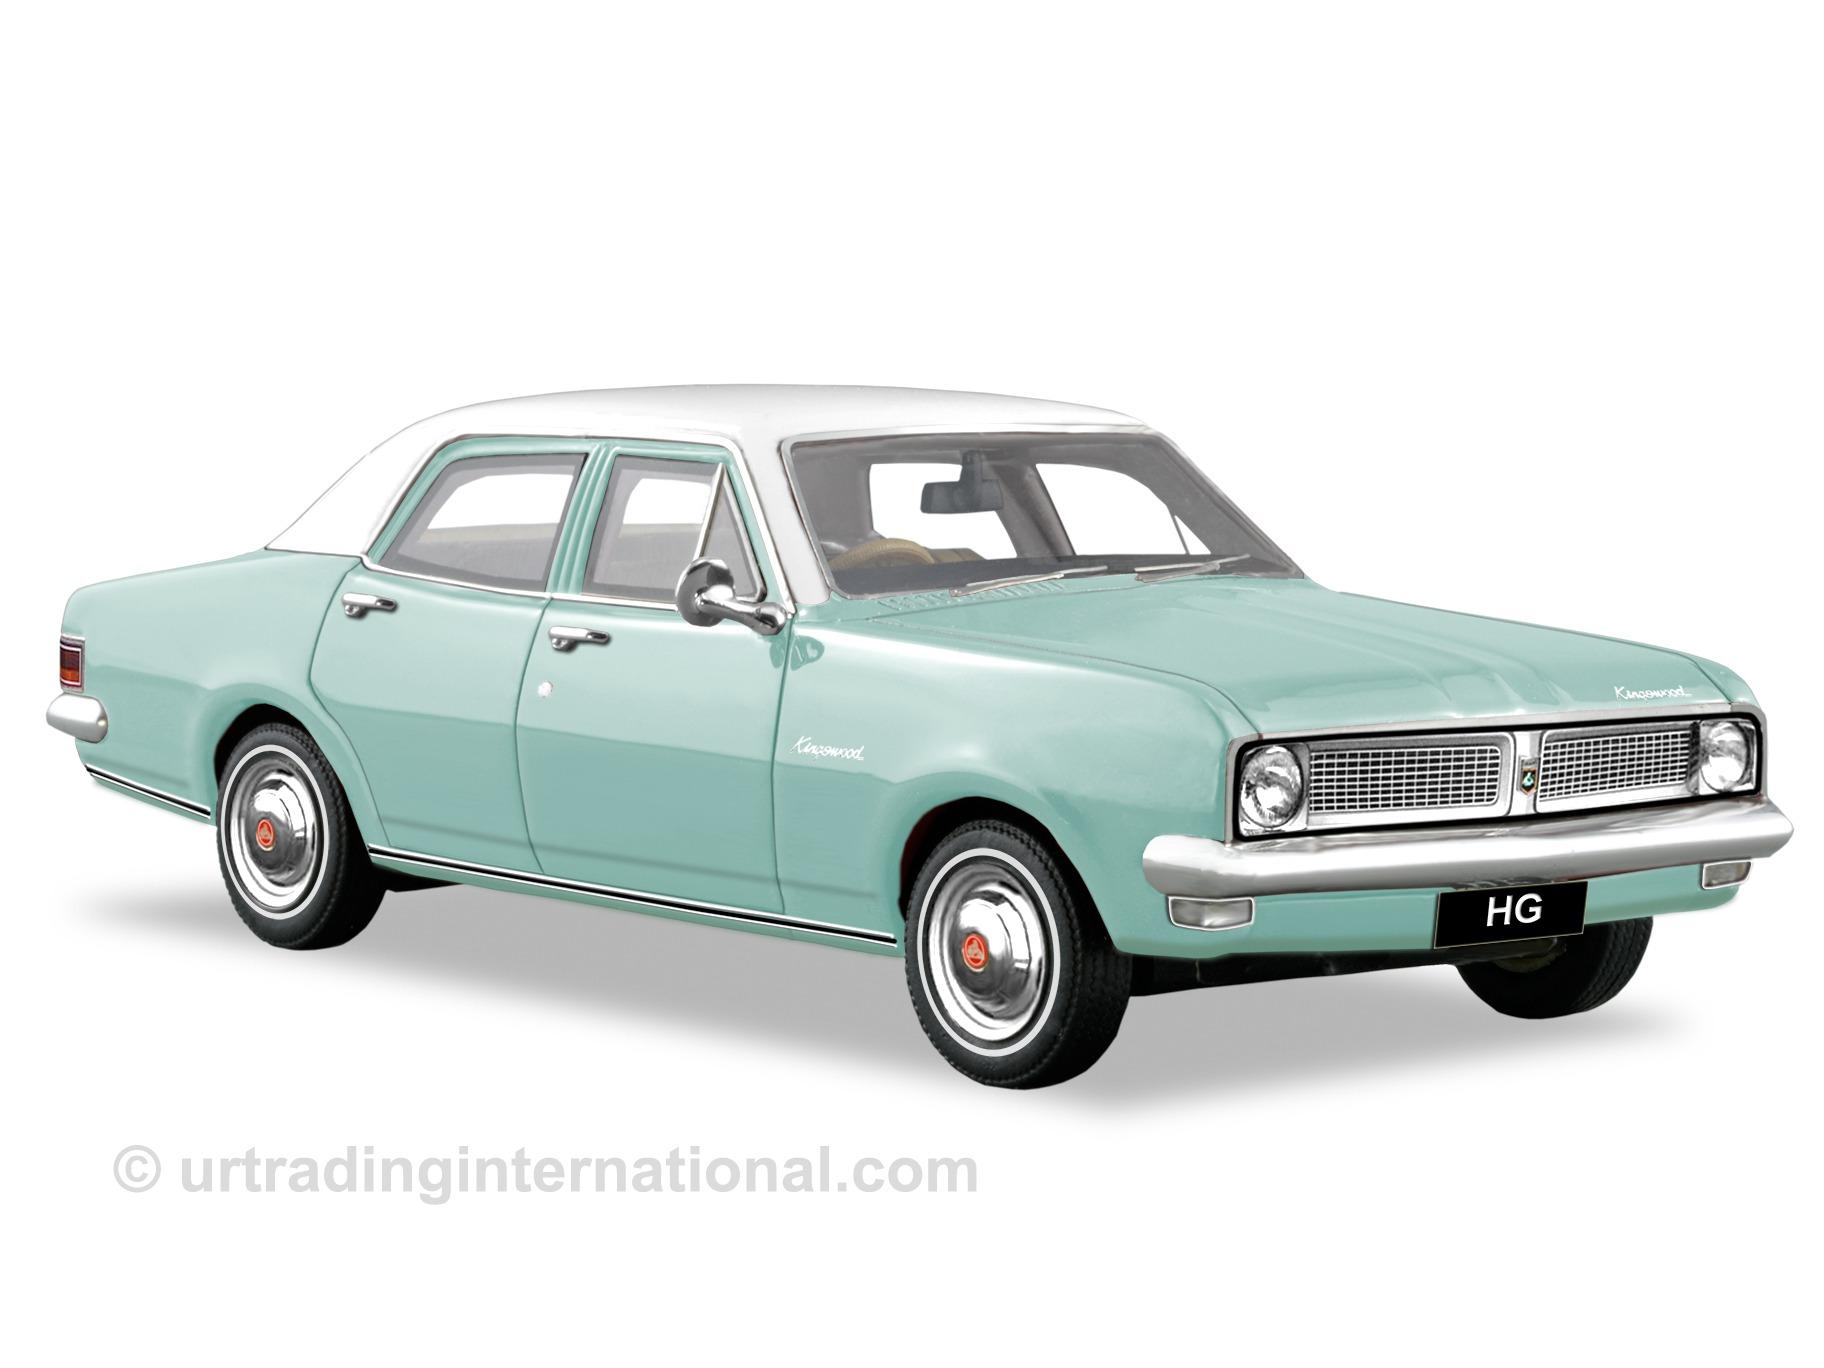 1970 HG Kingswood Sedan – Caribe Aqua / Kashmir White Roof